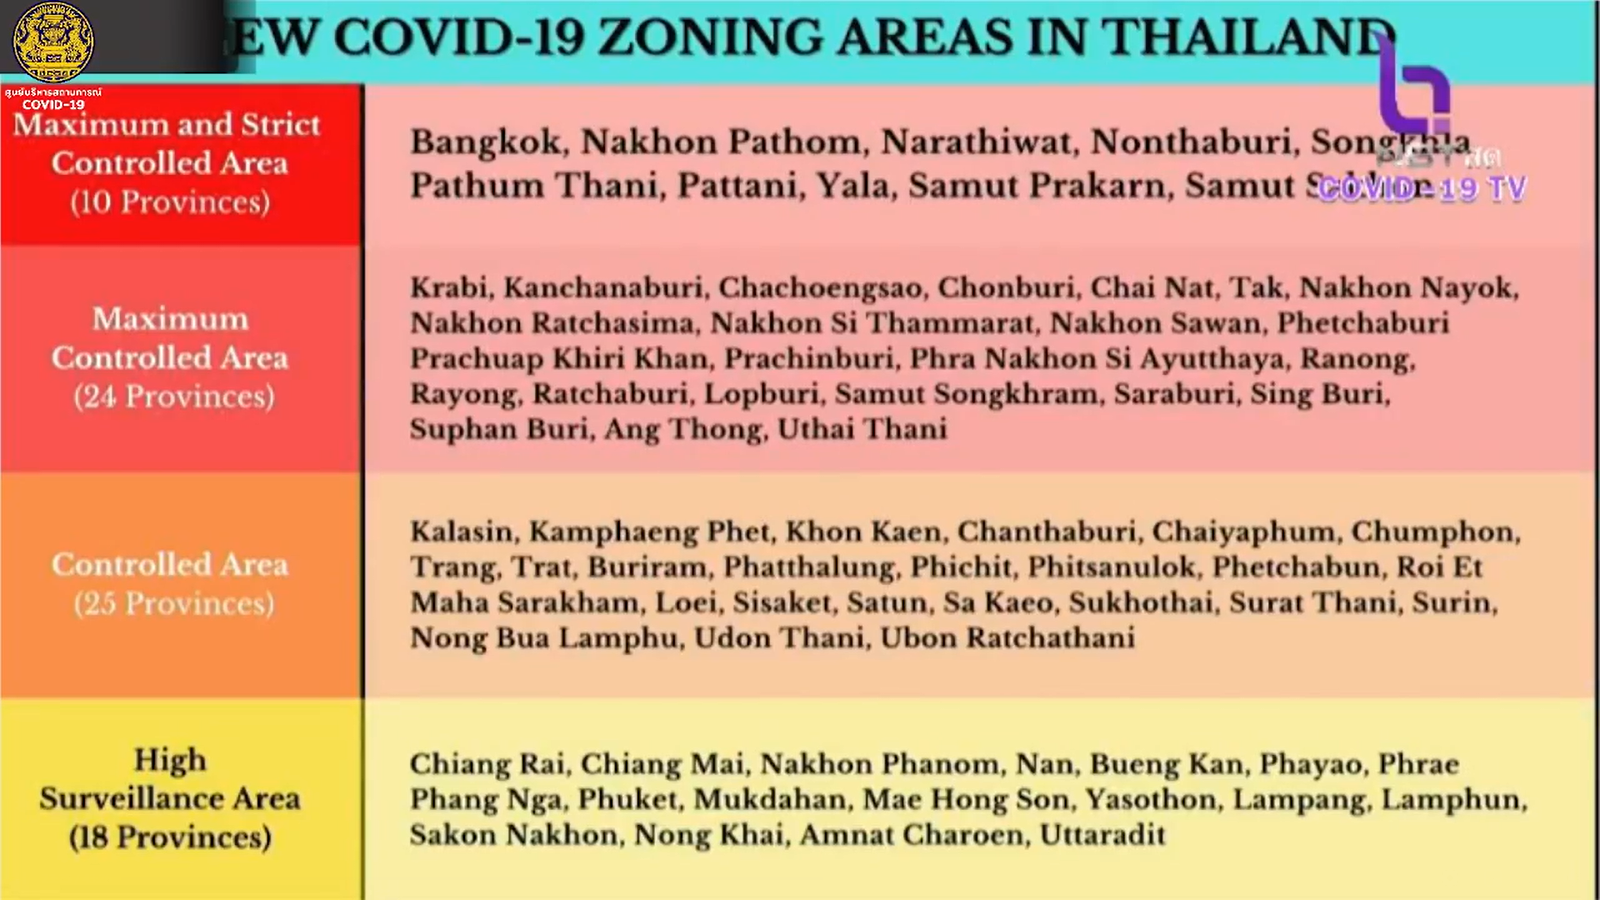 www.thaiguide.dk/images/forum/covid19/nye%20zoner%20provinser%2009-07-21.png